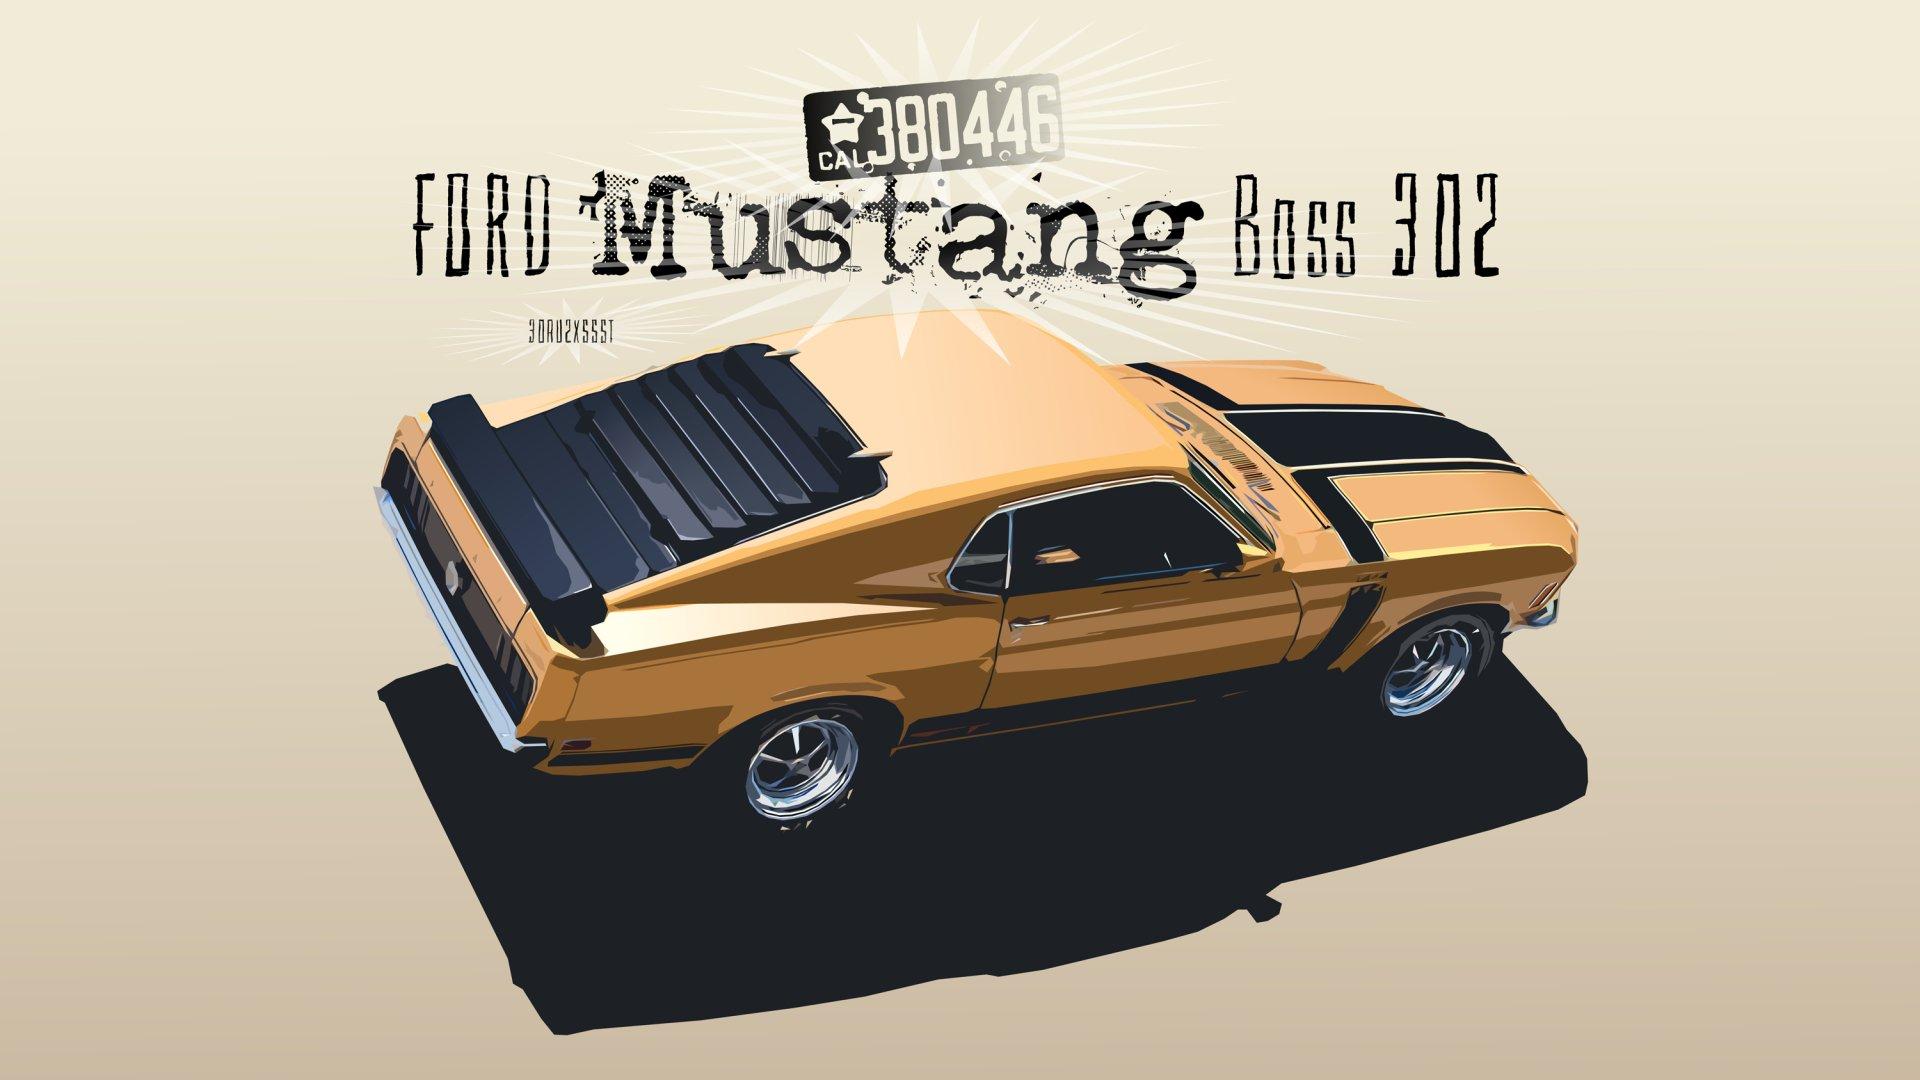 Vehicles - Ford Mustang Boss 302  Ford Ford Mustang Car Vehicle Artistic Digital Art Sport Car Race Car Wallpaper